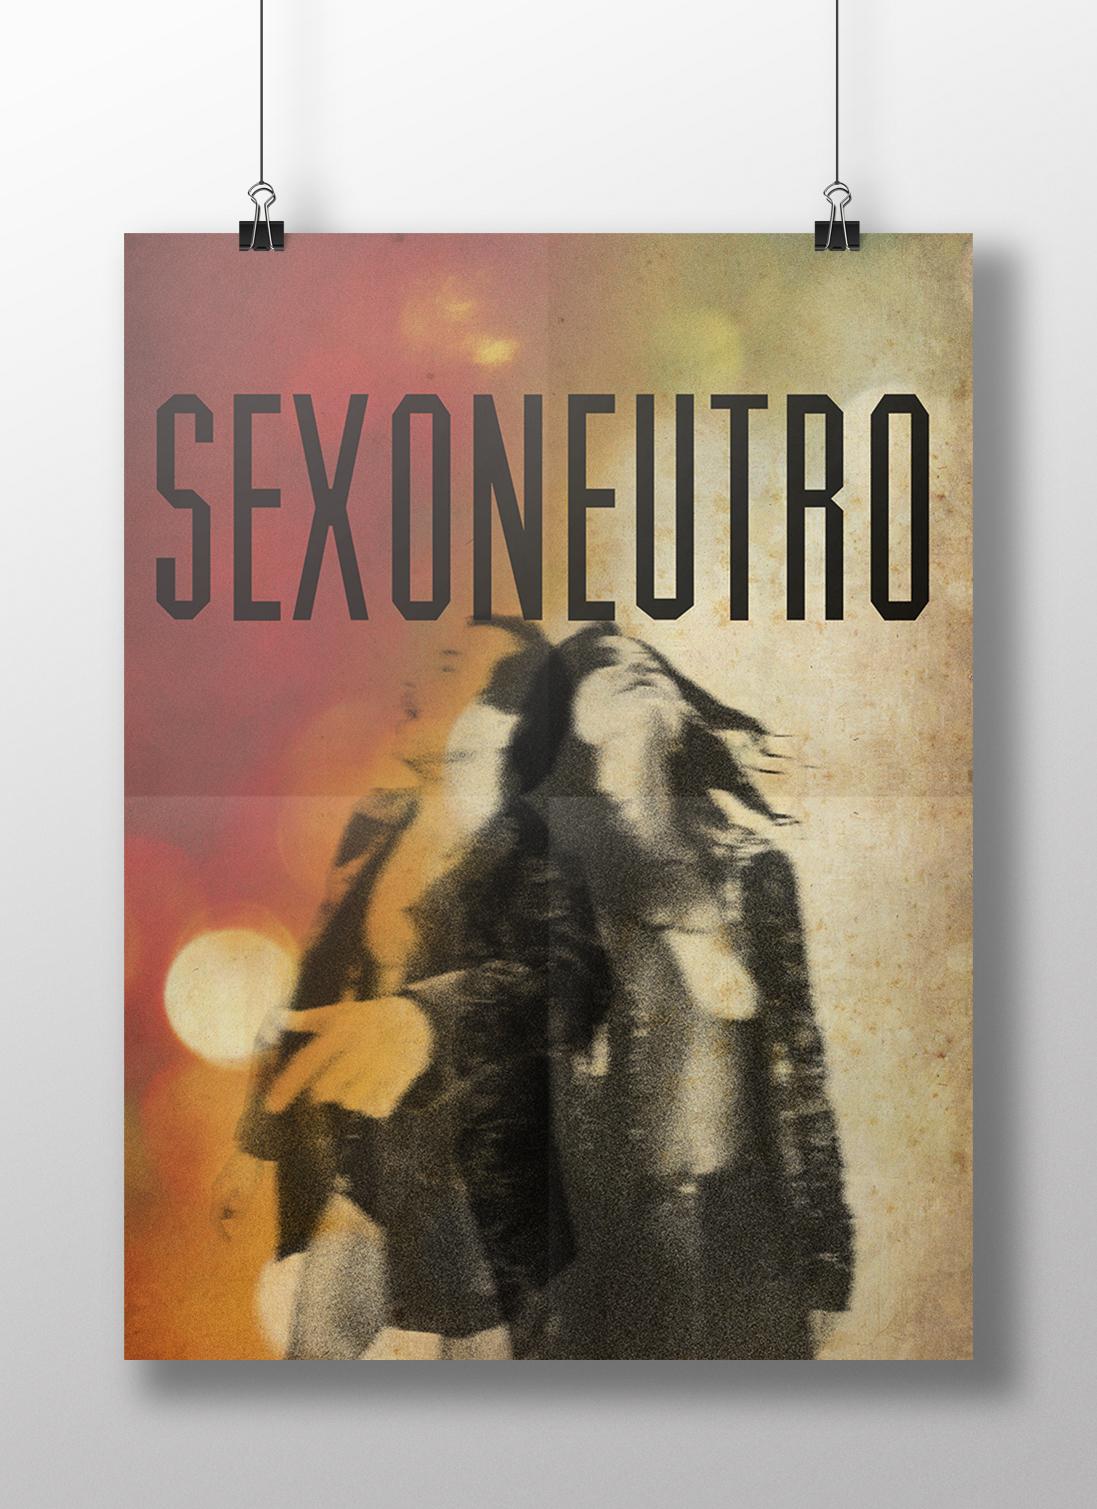 sexo_neutro_cartaz